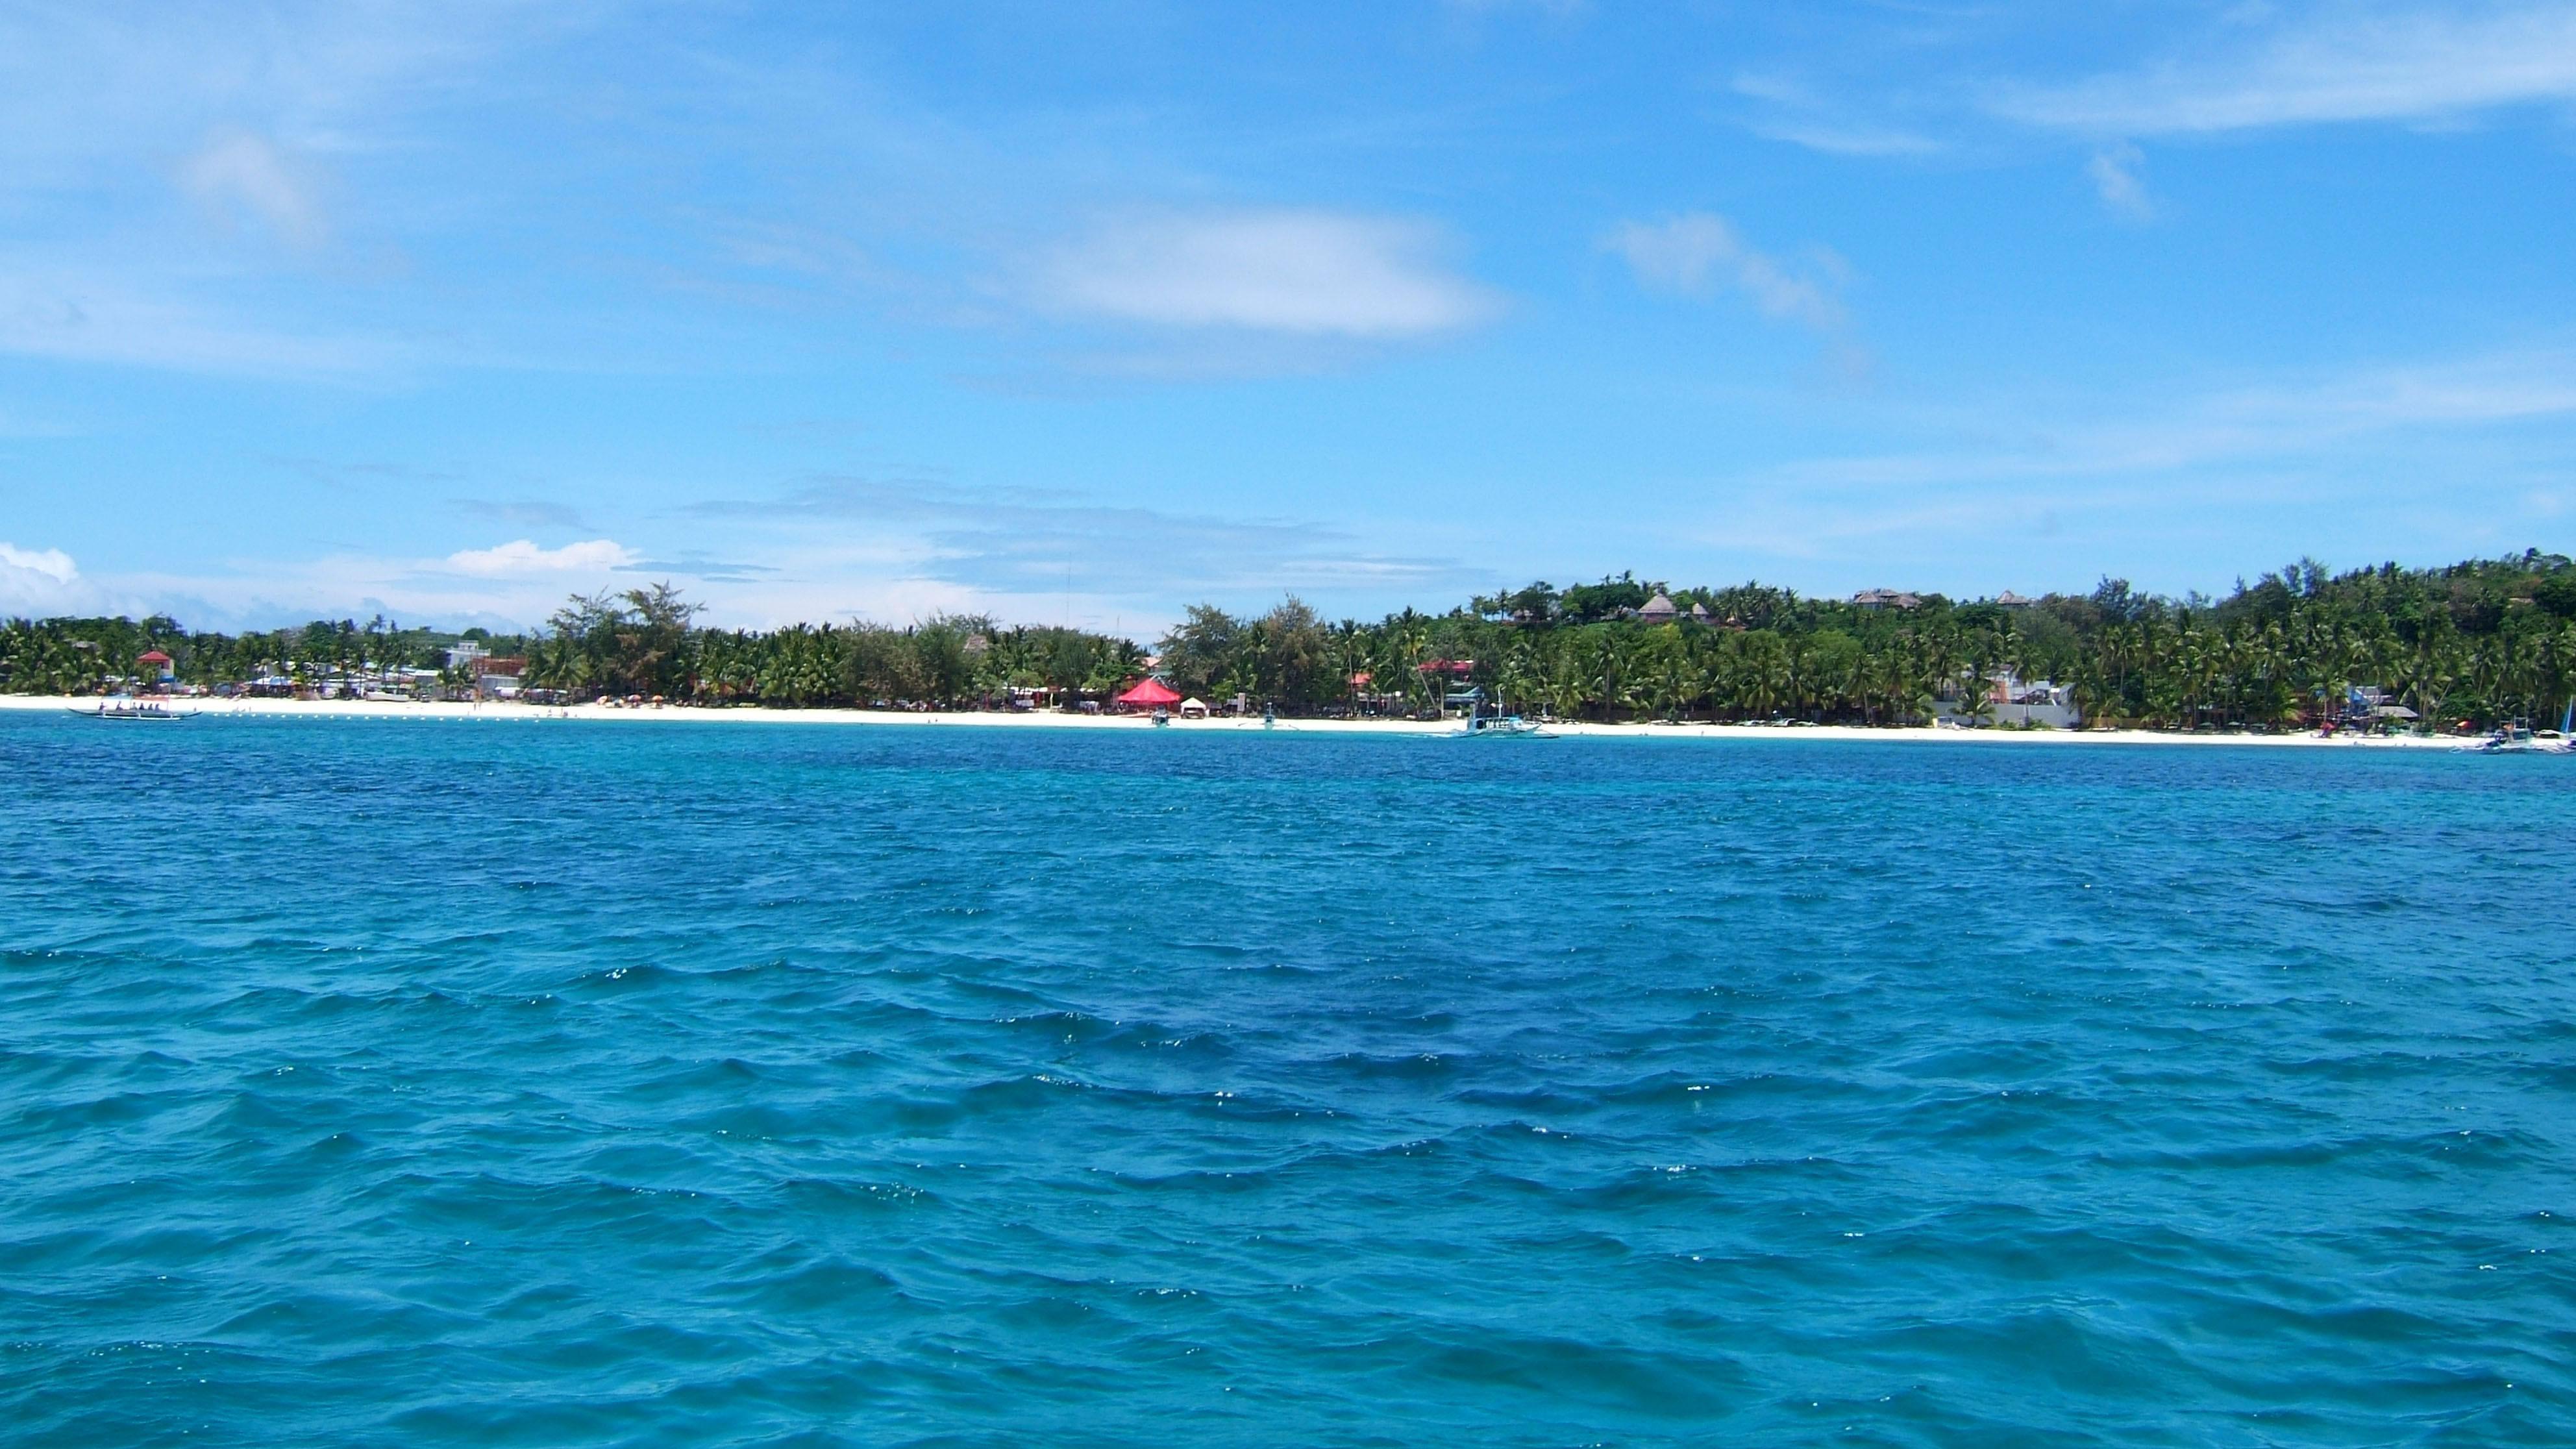 Philippines Sugar Islands Caticlan Boracay White Beach Apr 2006 01